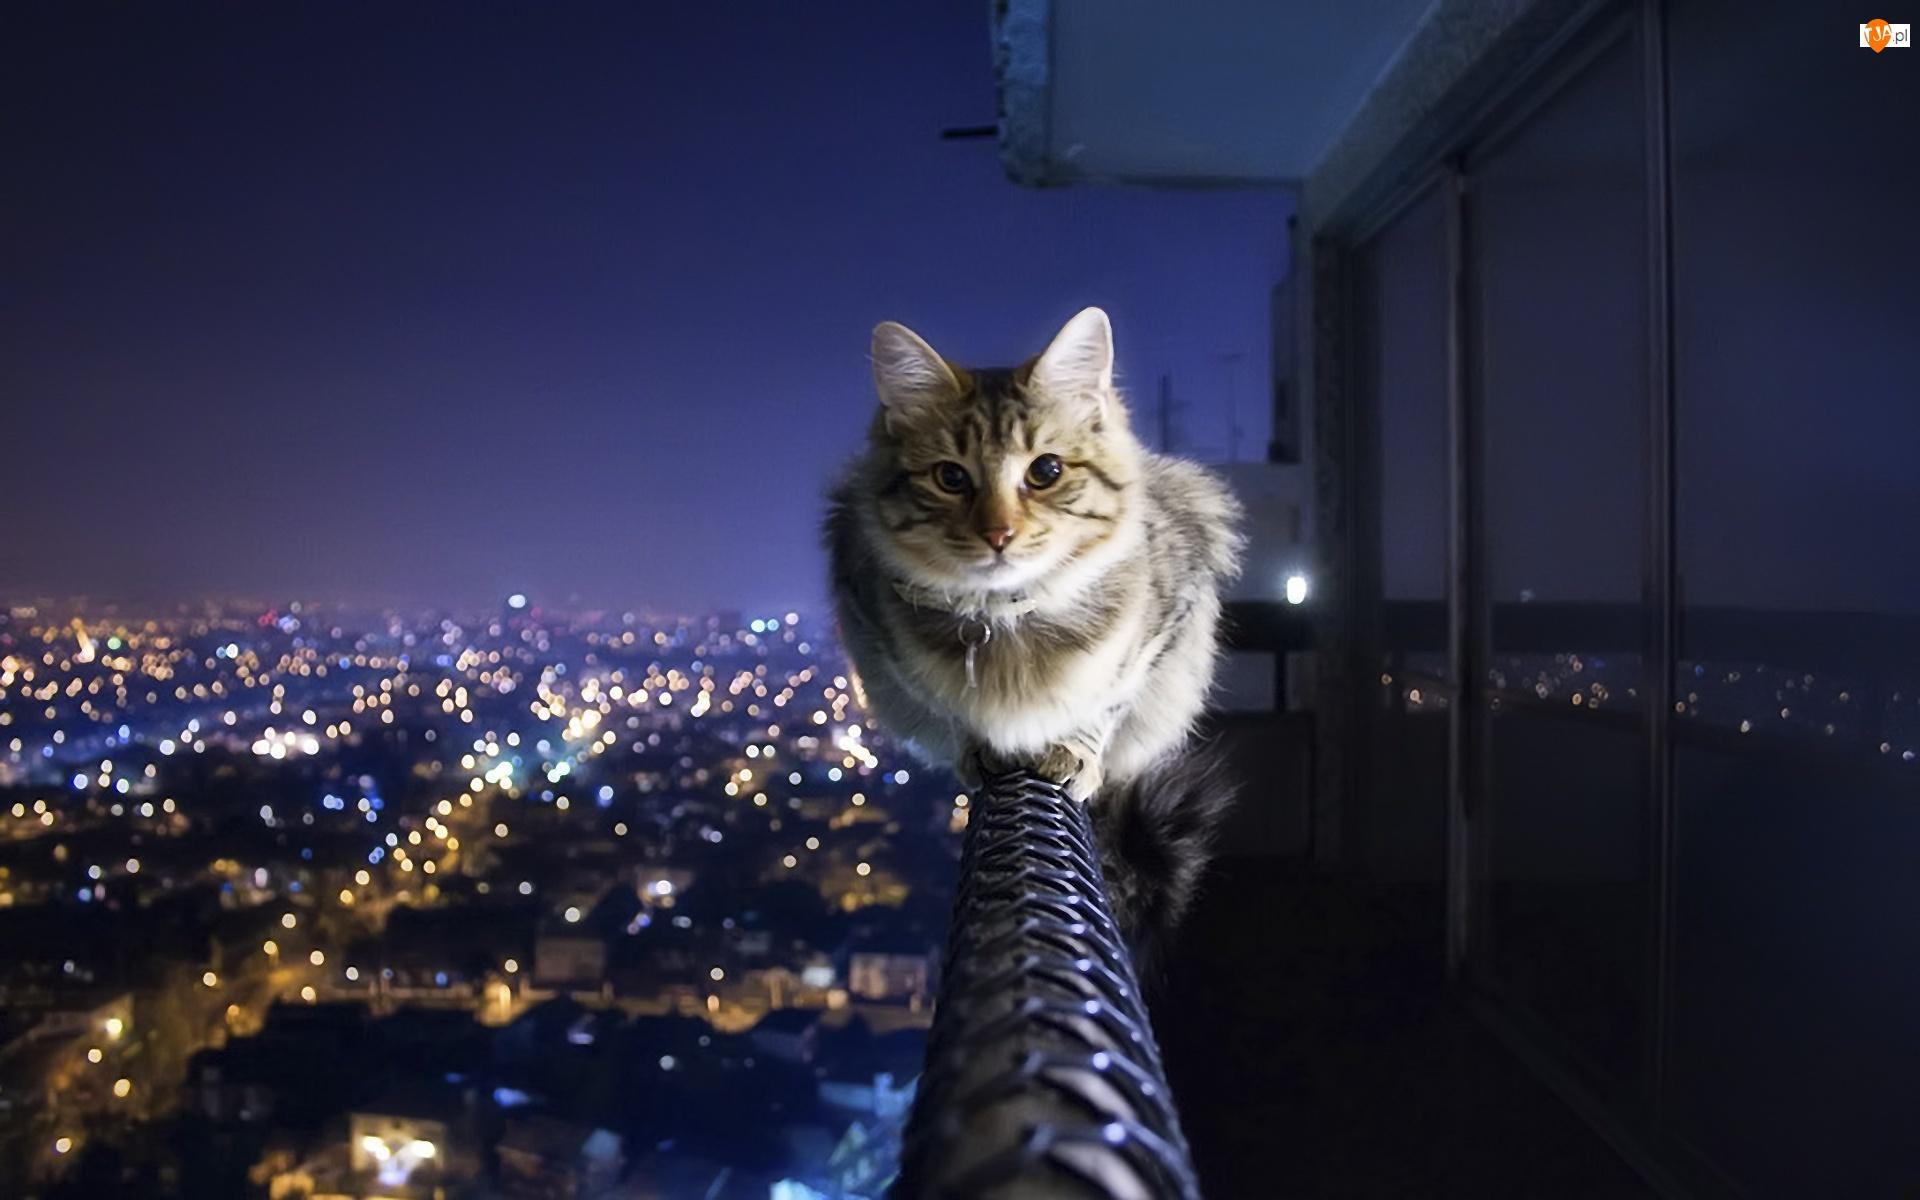 Miasto, Kot, Noc, Balustrada